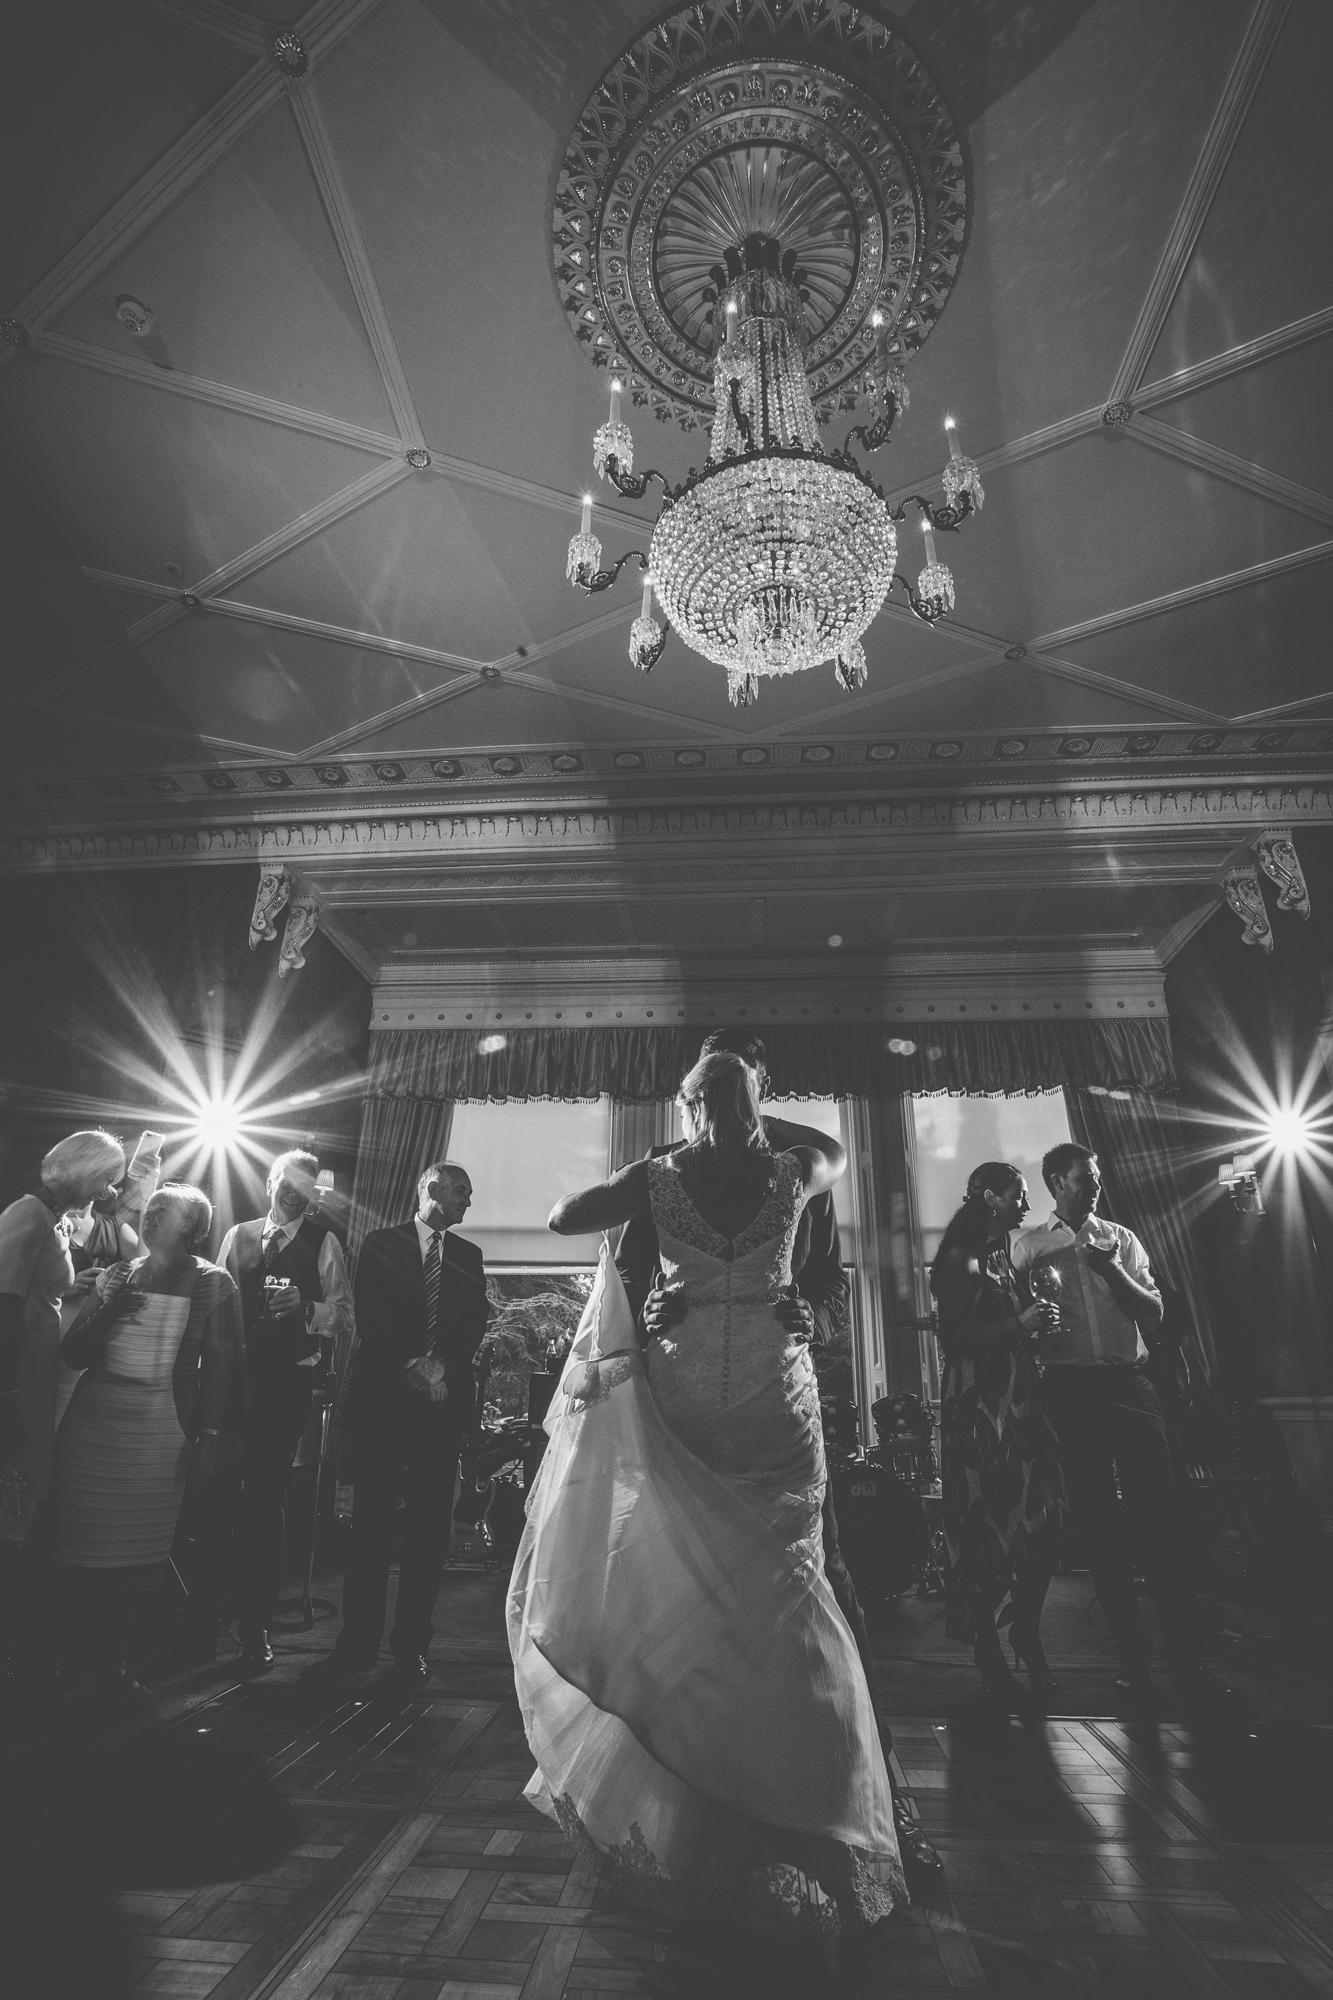 bowcliffe hall wedding photographers yorkshire-74.jpg